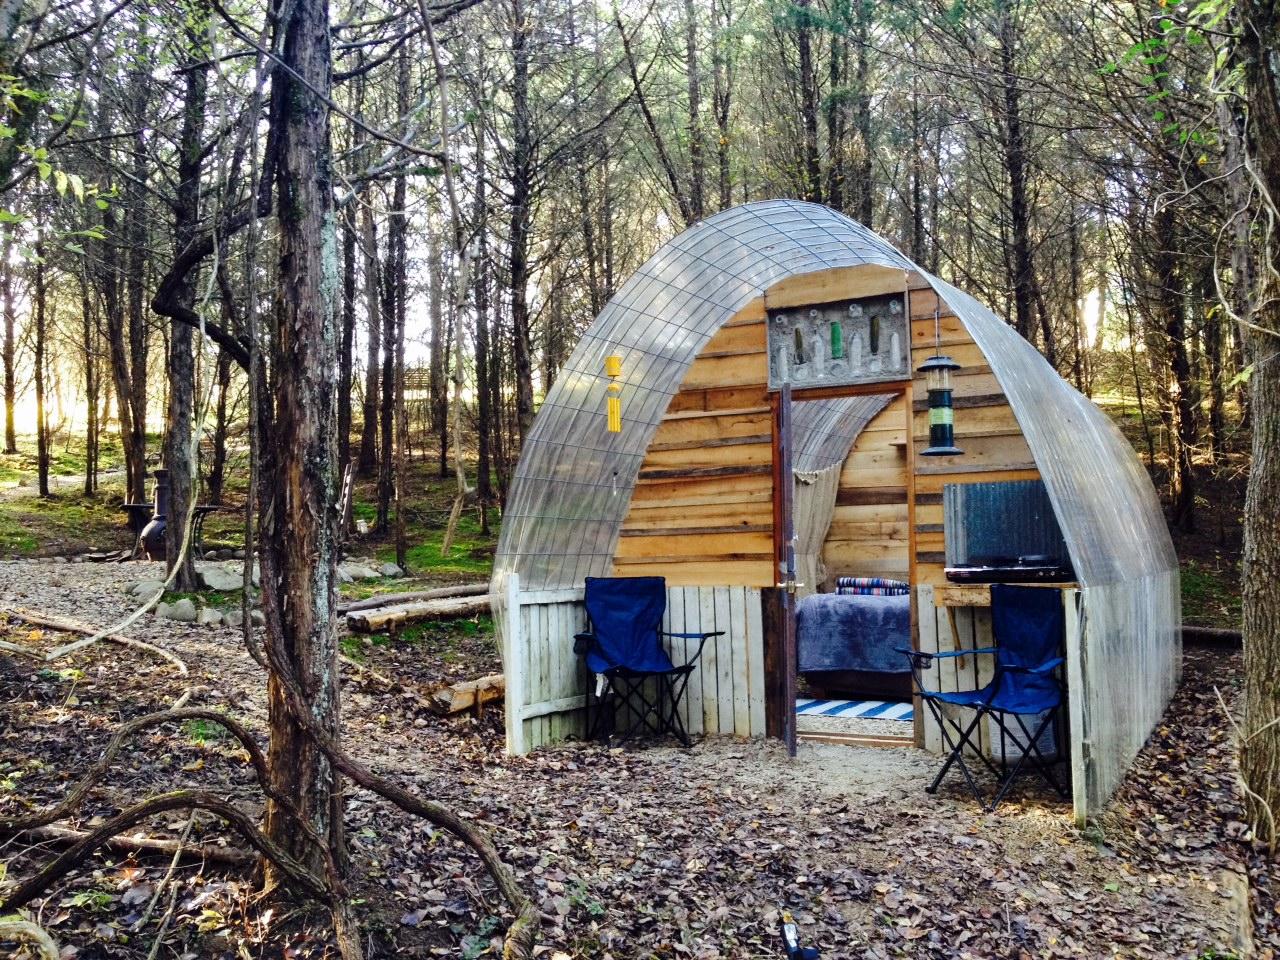 Stargazing Hut, Mossy Forest Glamping